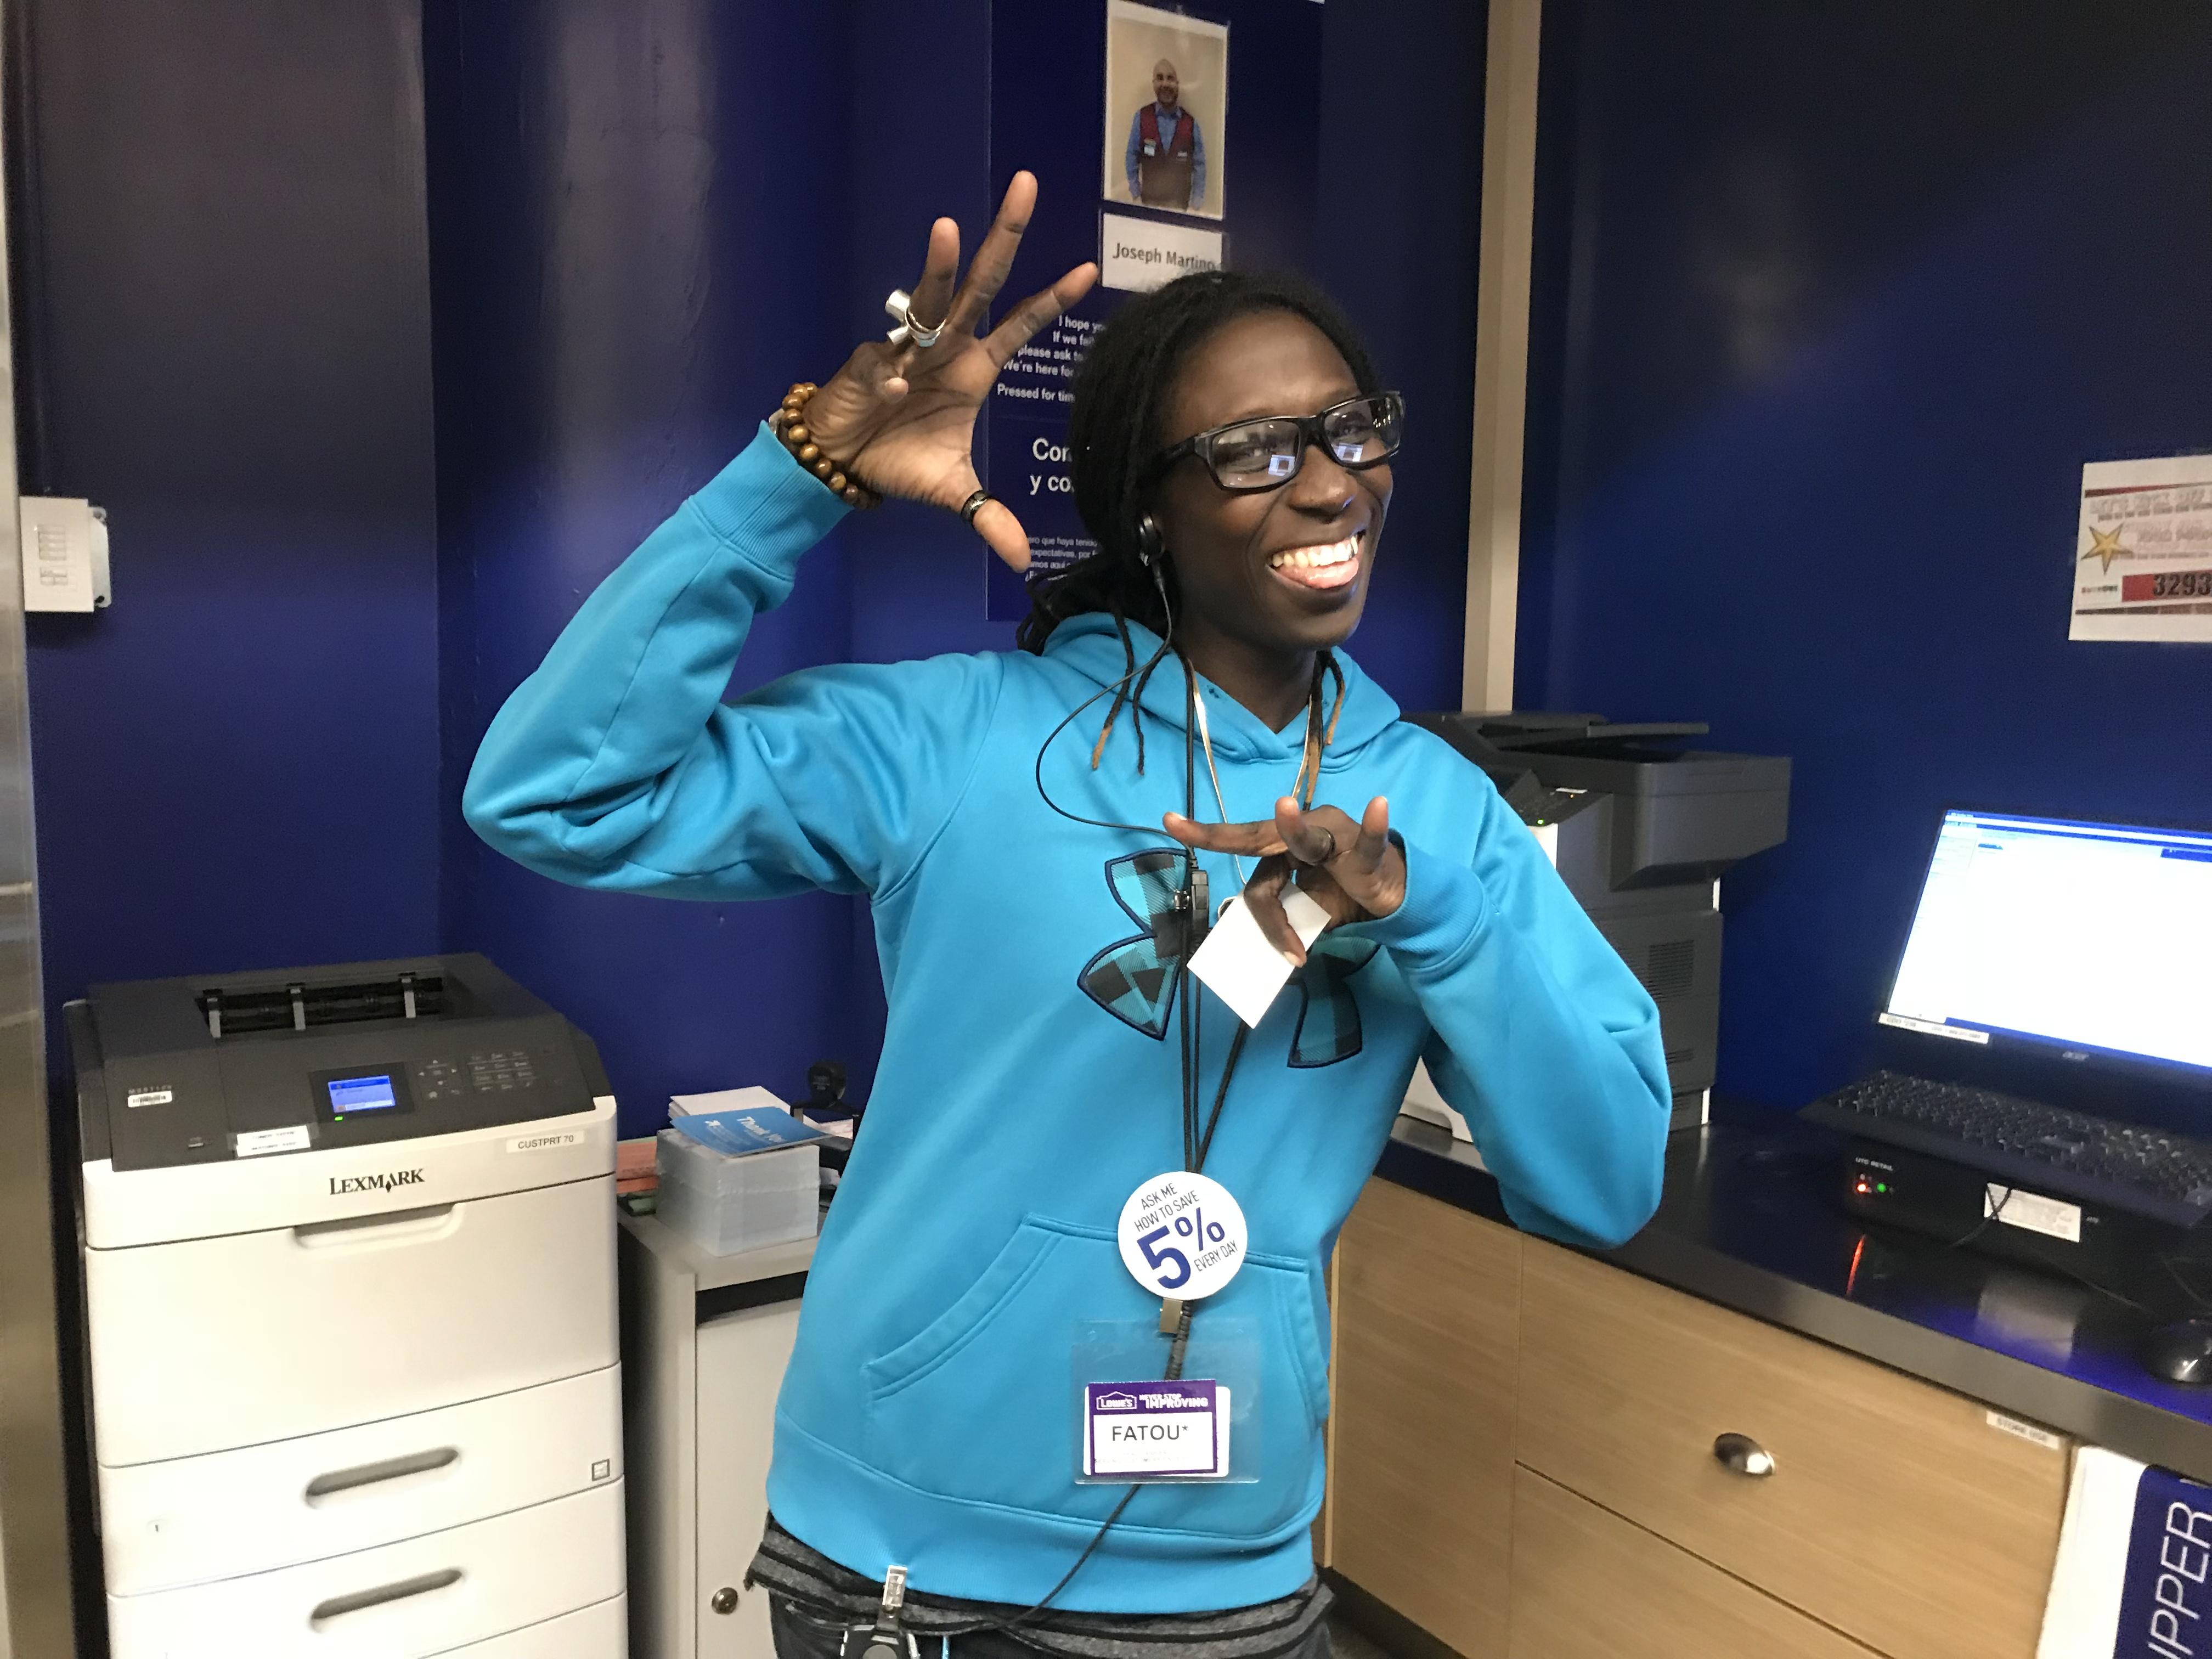 Fatou, Customer Service extraordinaire, Chelsea